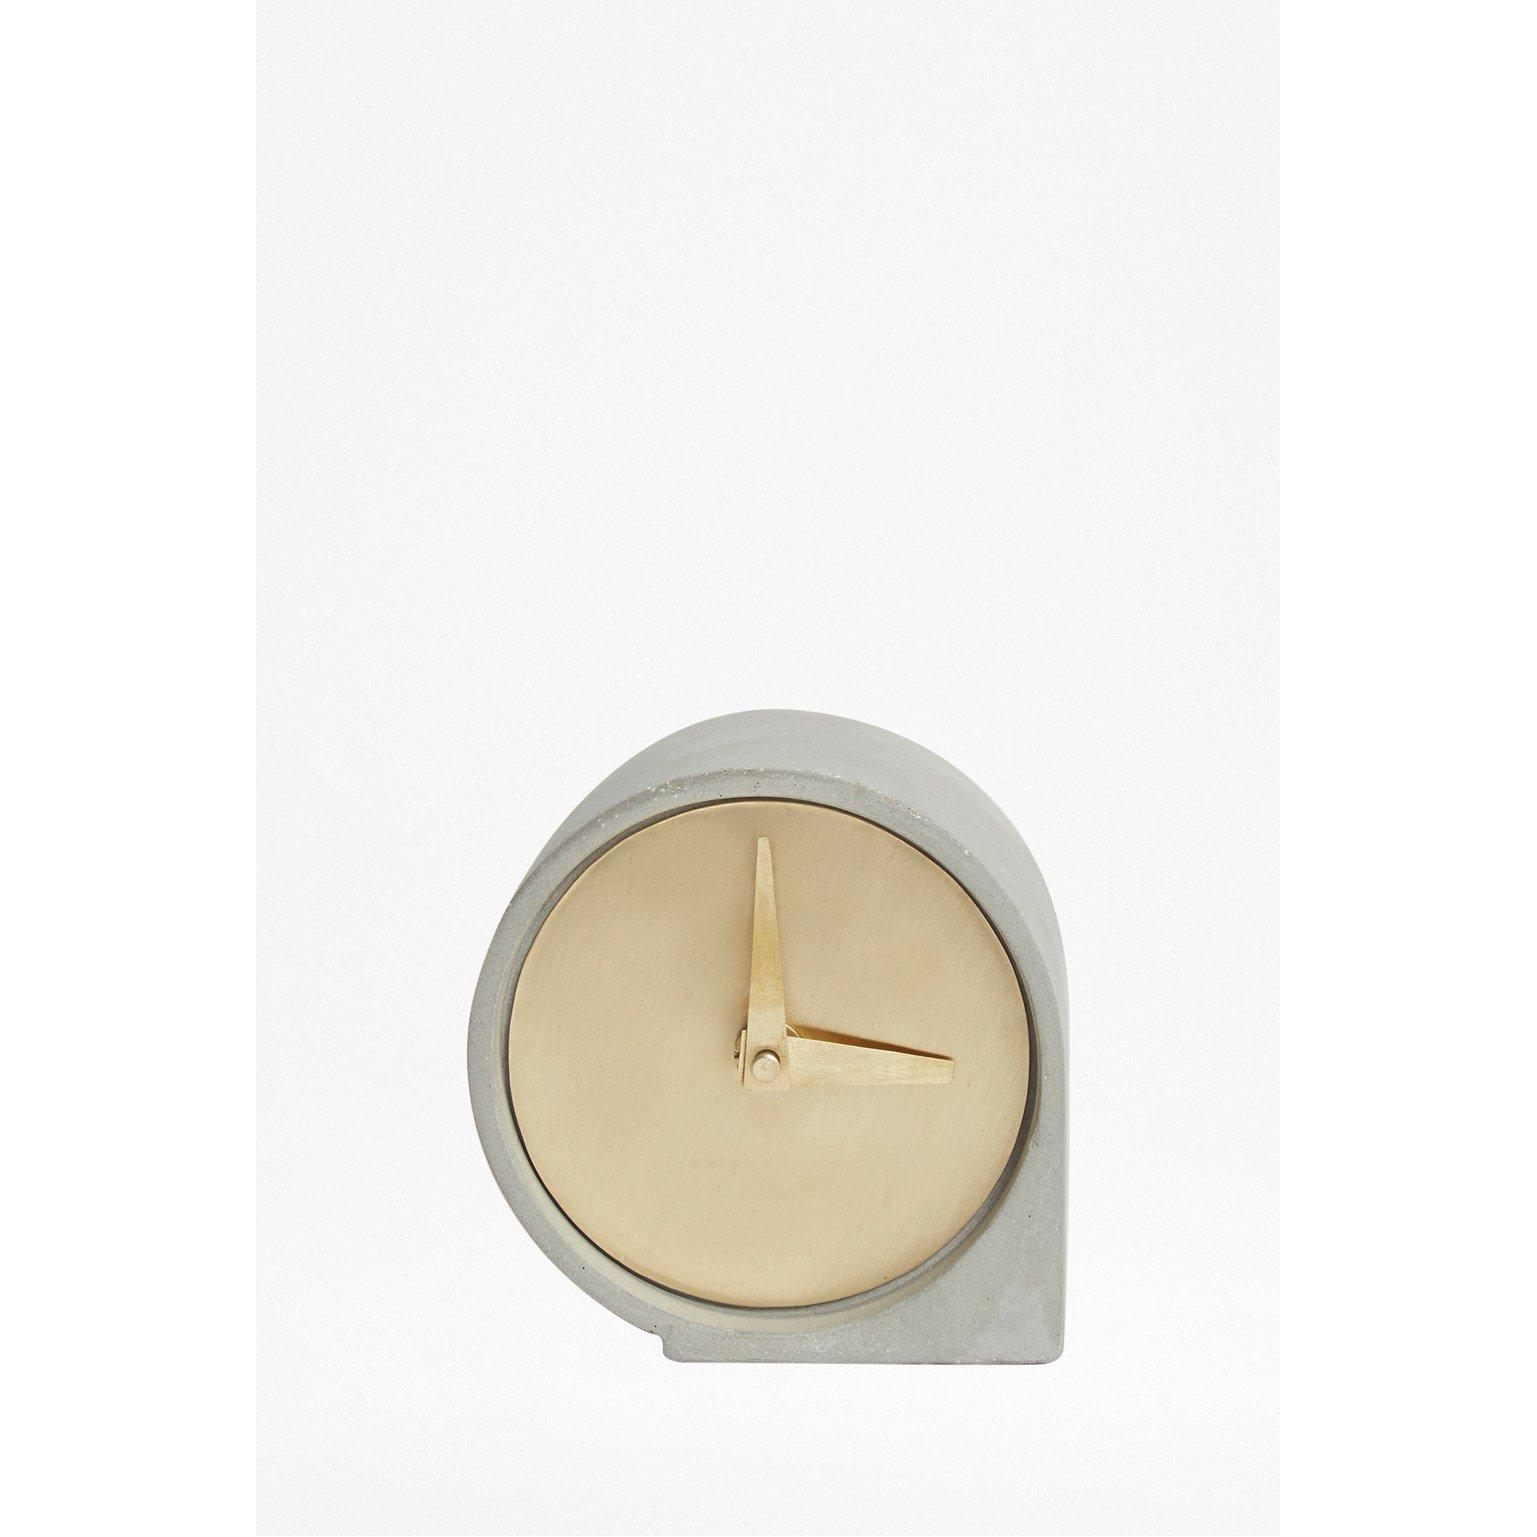 image-Concrete Desk Clock - grey